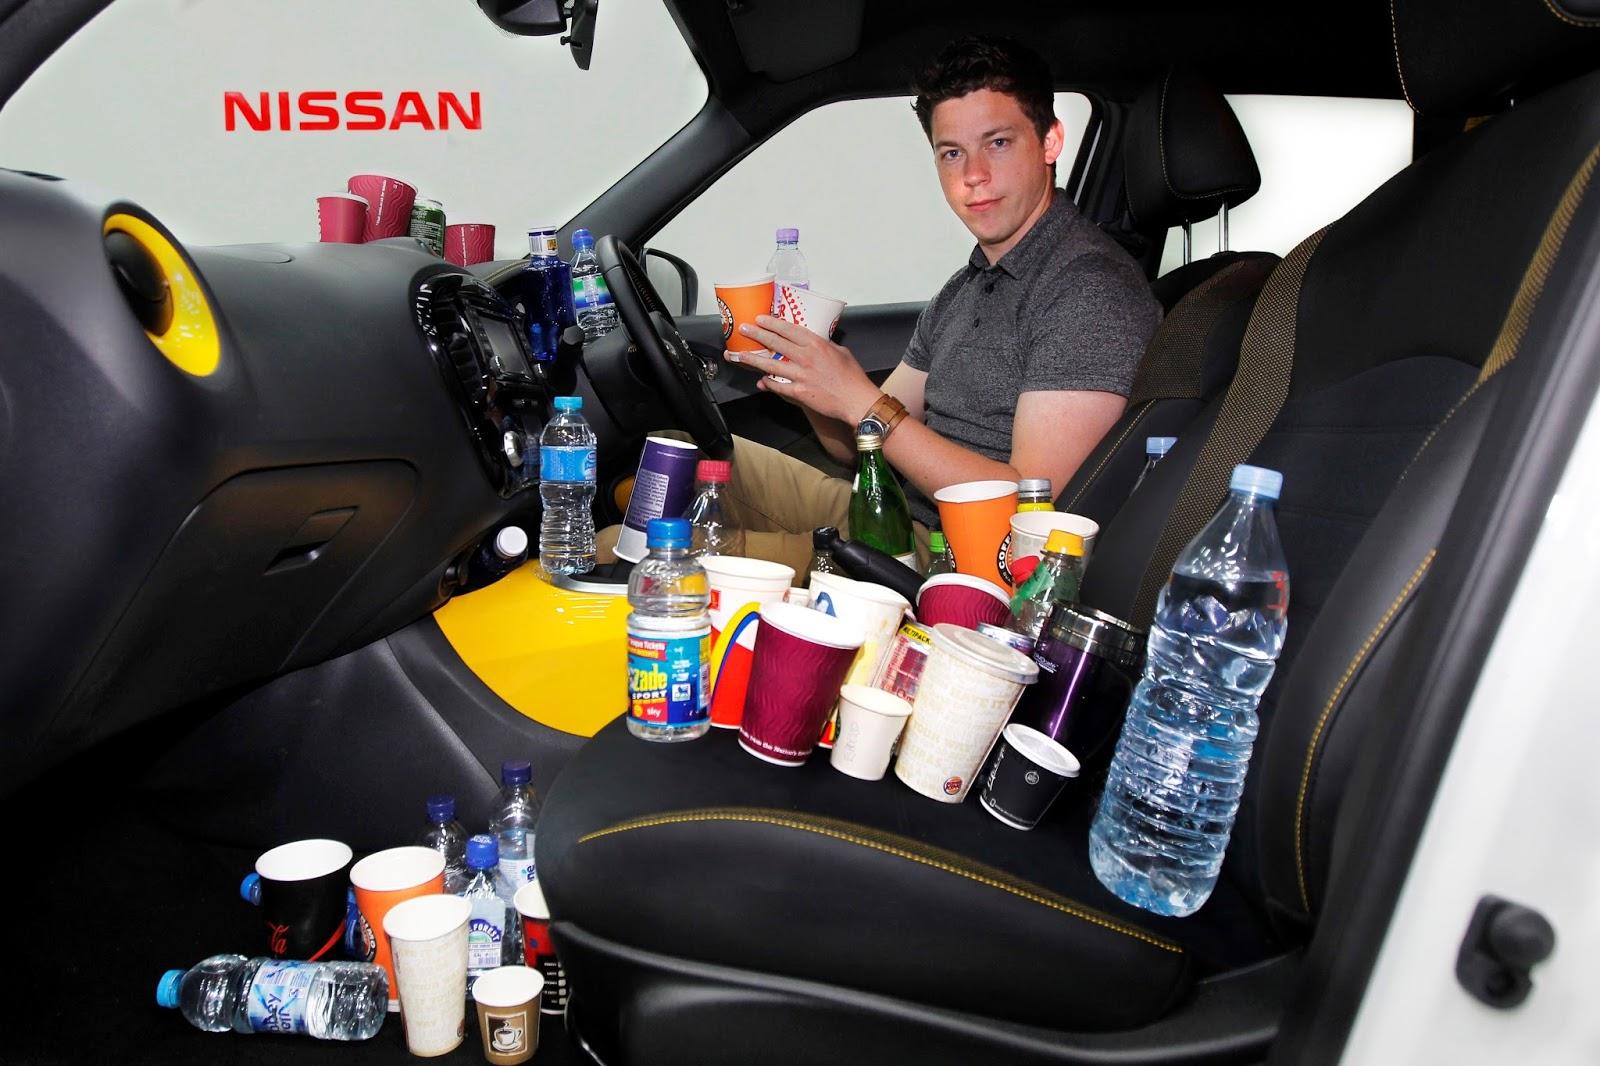 147256 1 5 Tι ξεχωριστό έχουν οι ποτηροθήκες στα μοντέλα της Nissan; Nissan